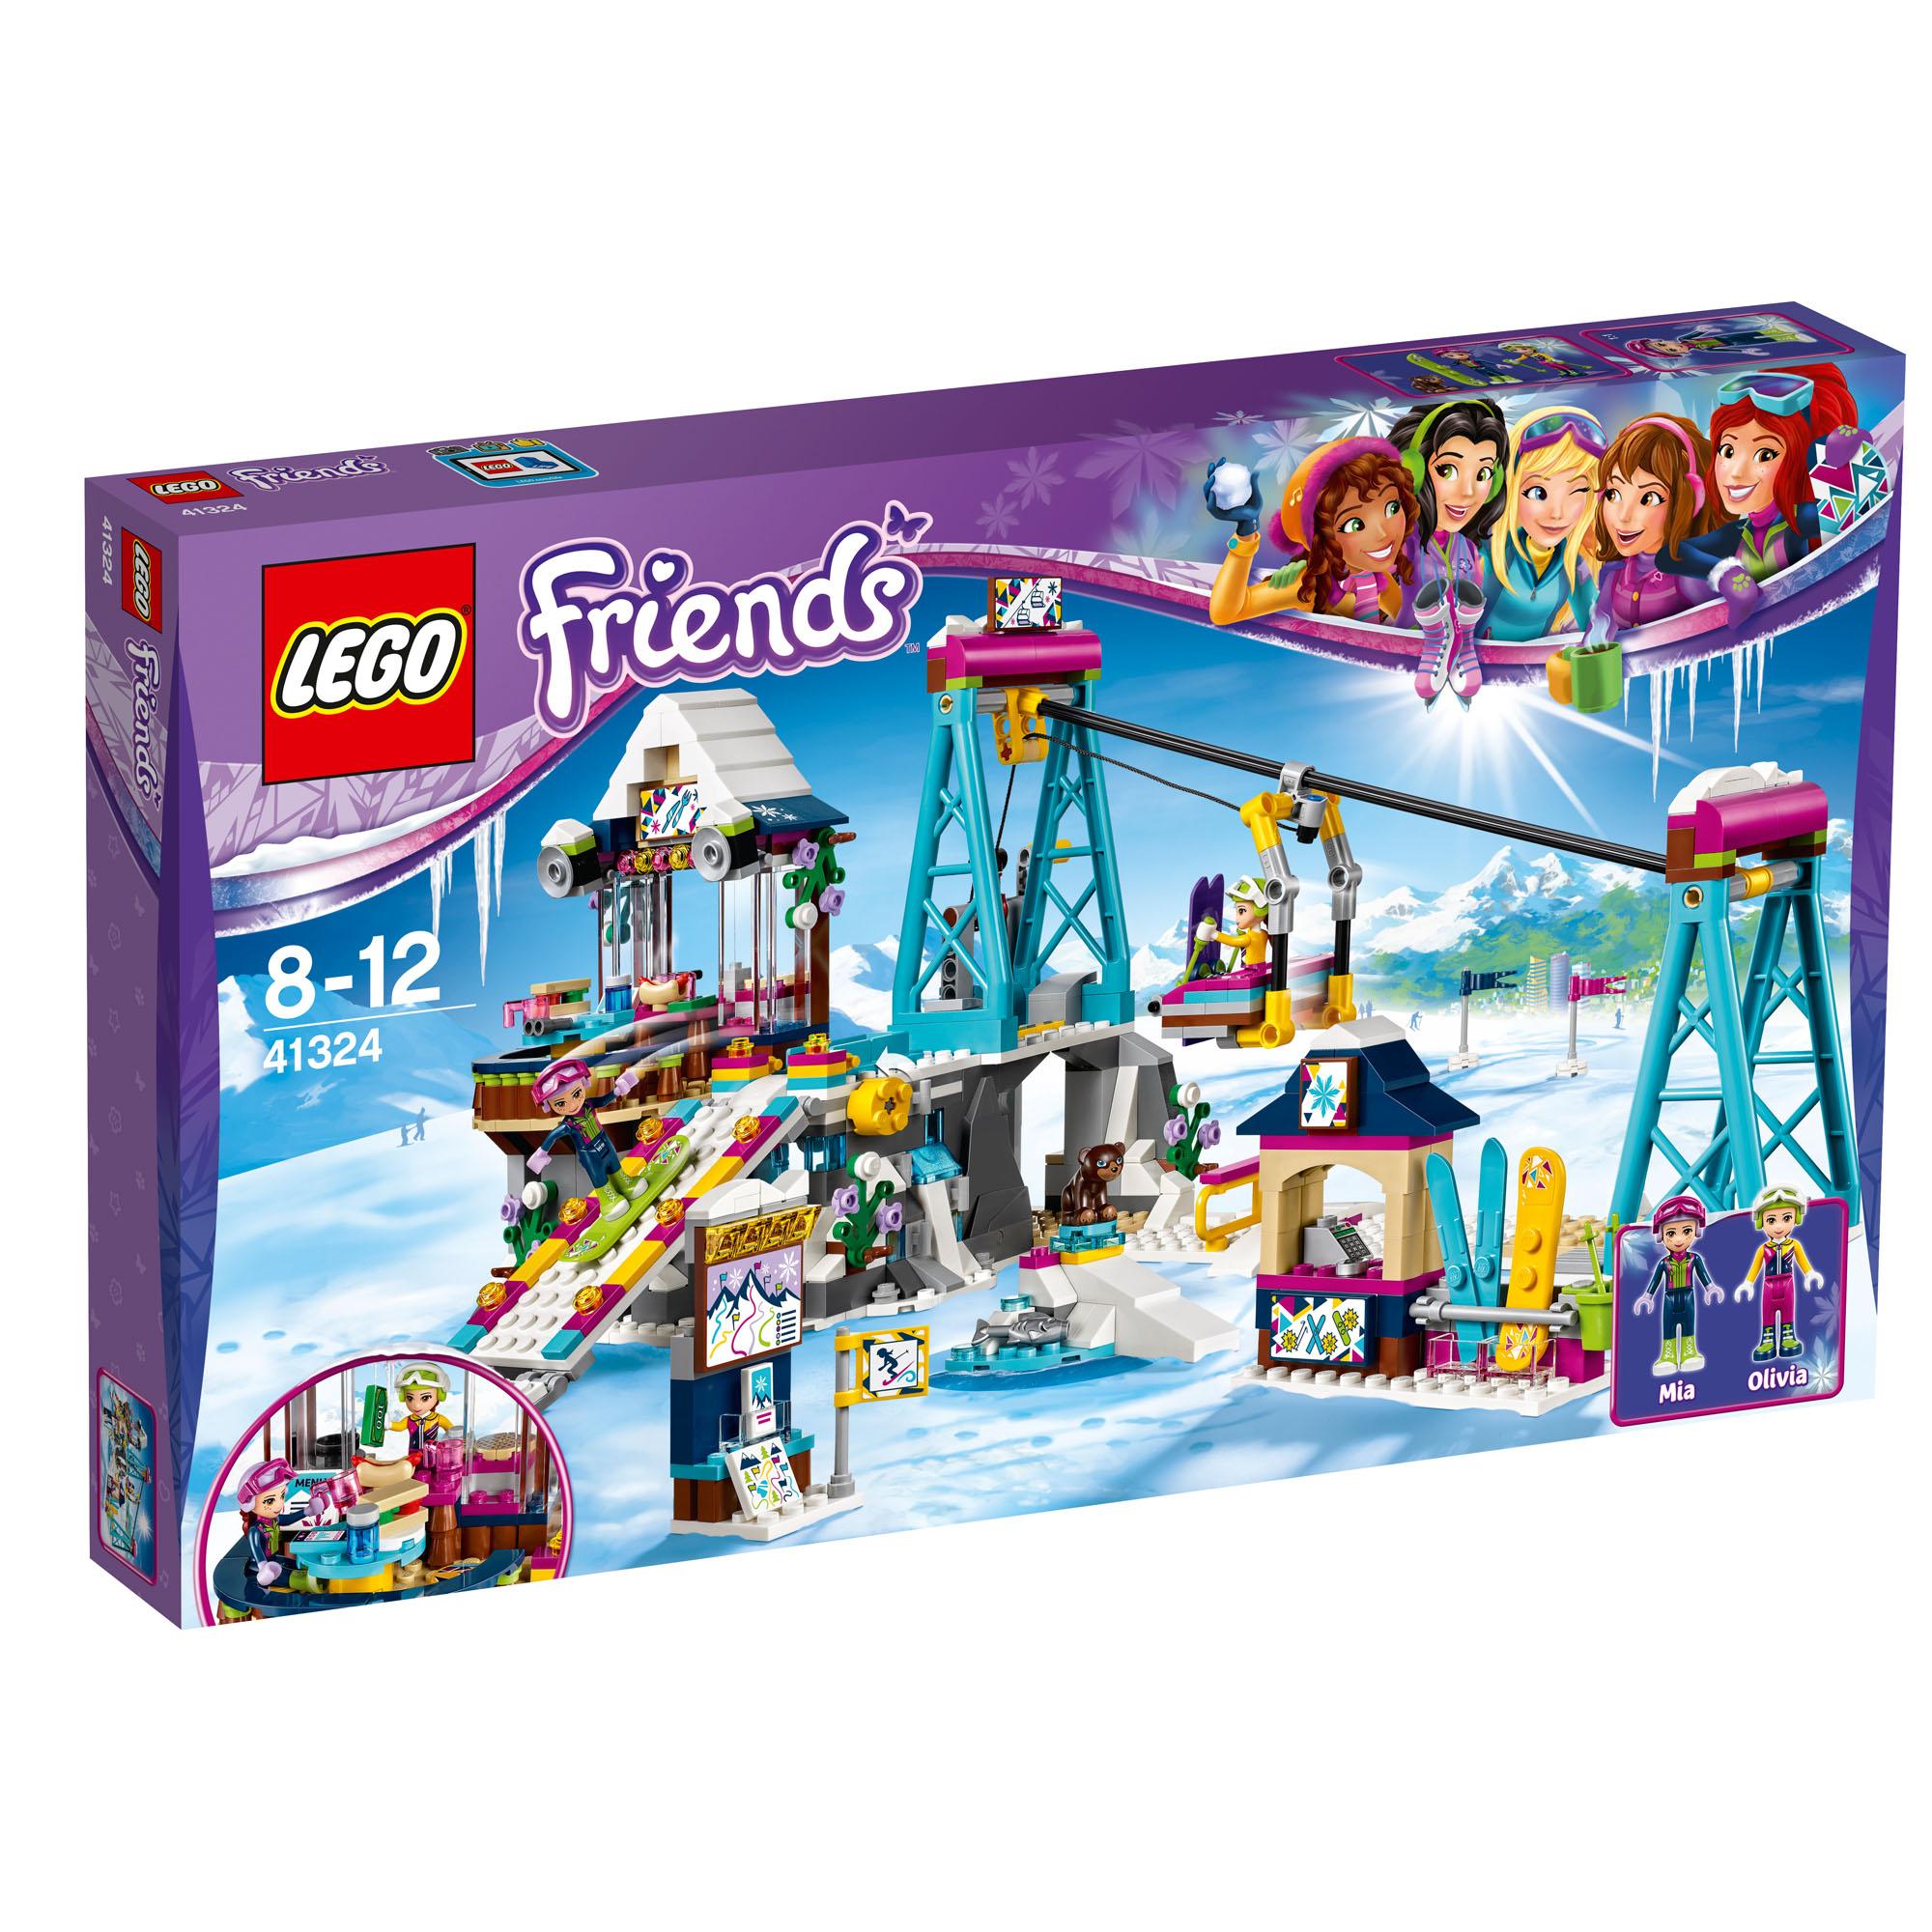 41324 LEGO Friends Snow Resort Ski Lift Set 585 Pieces Age ...